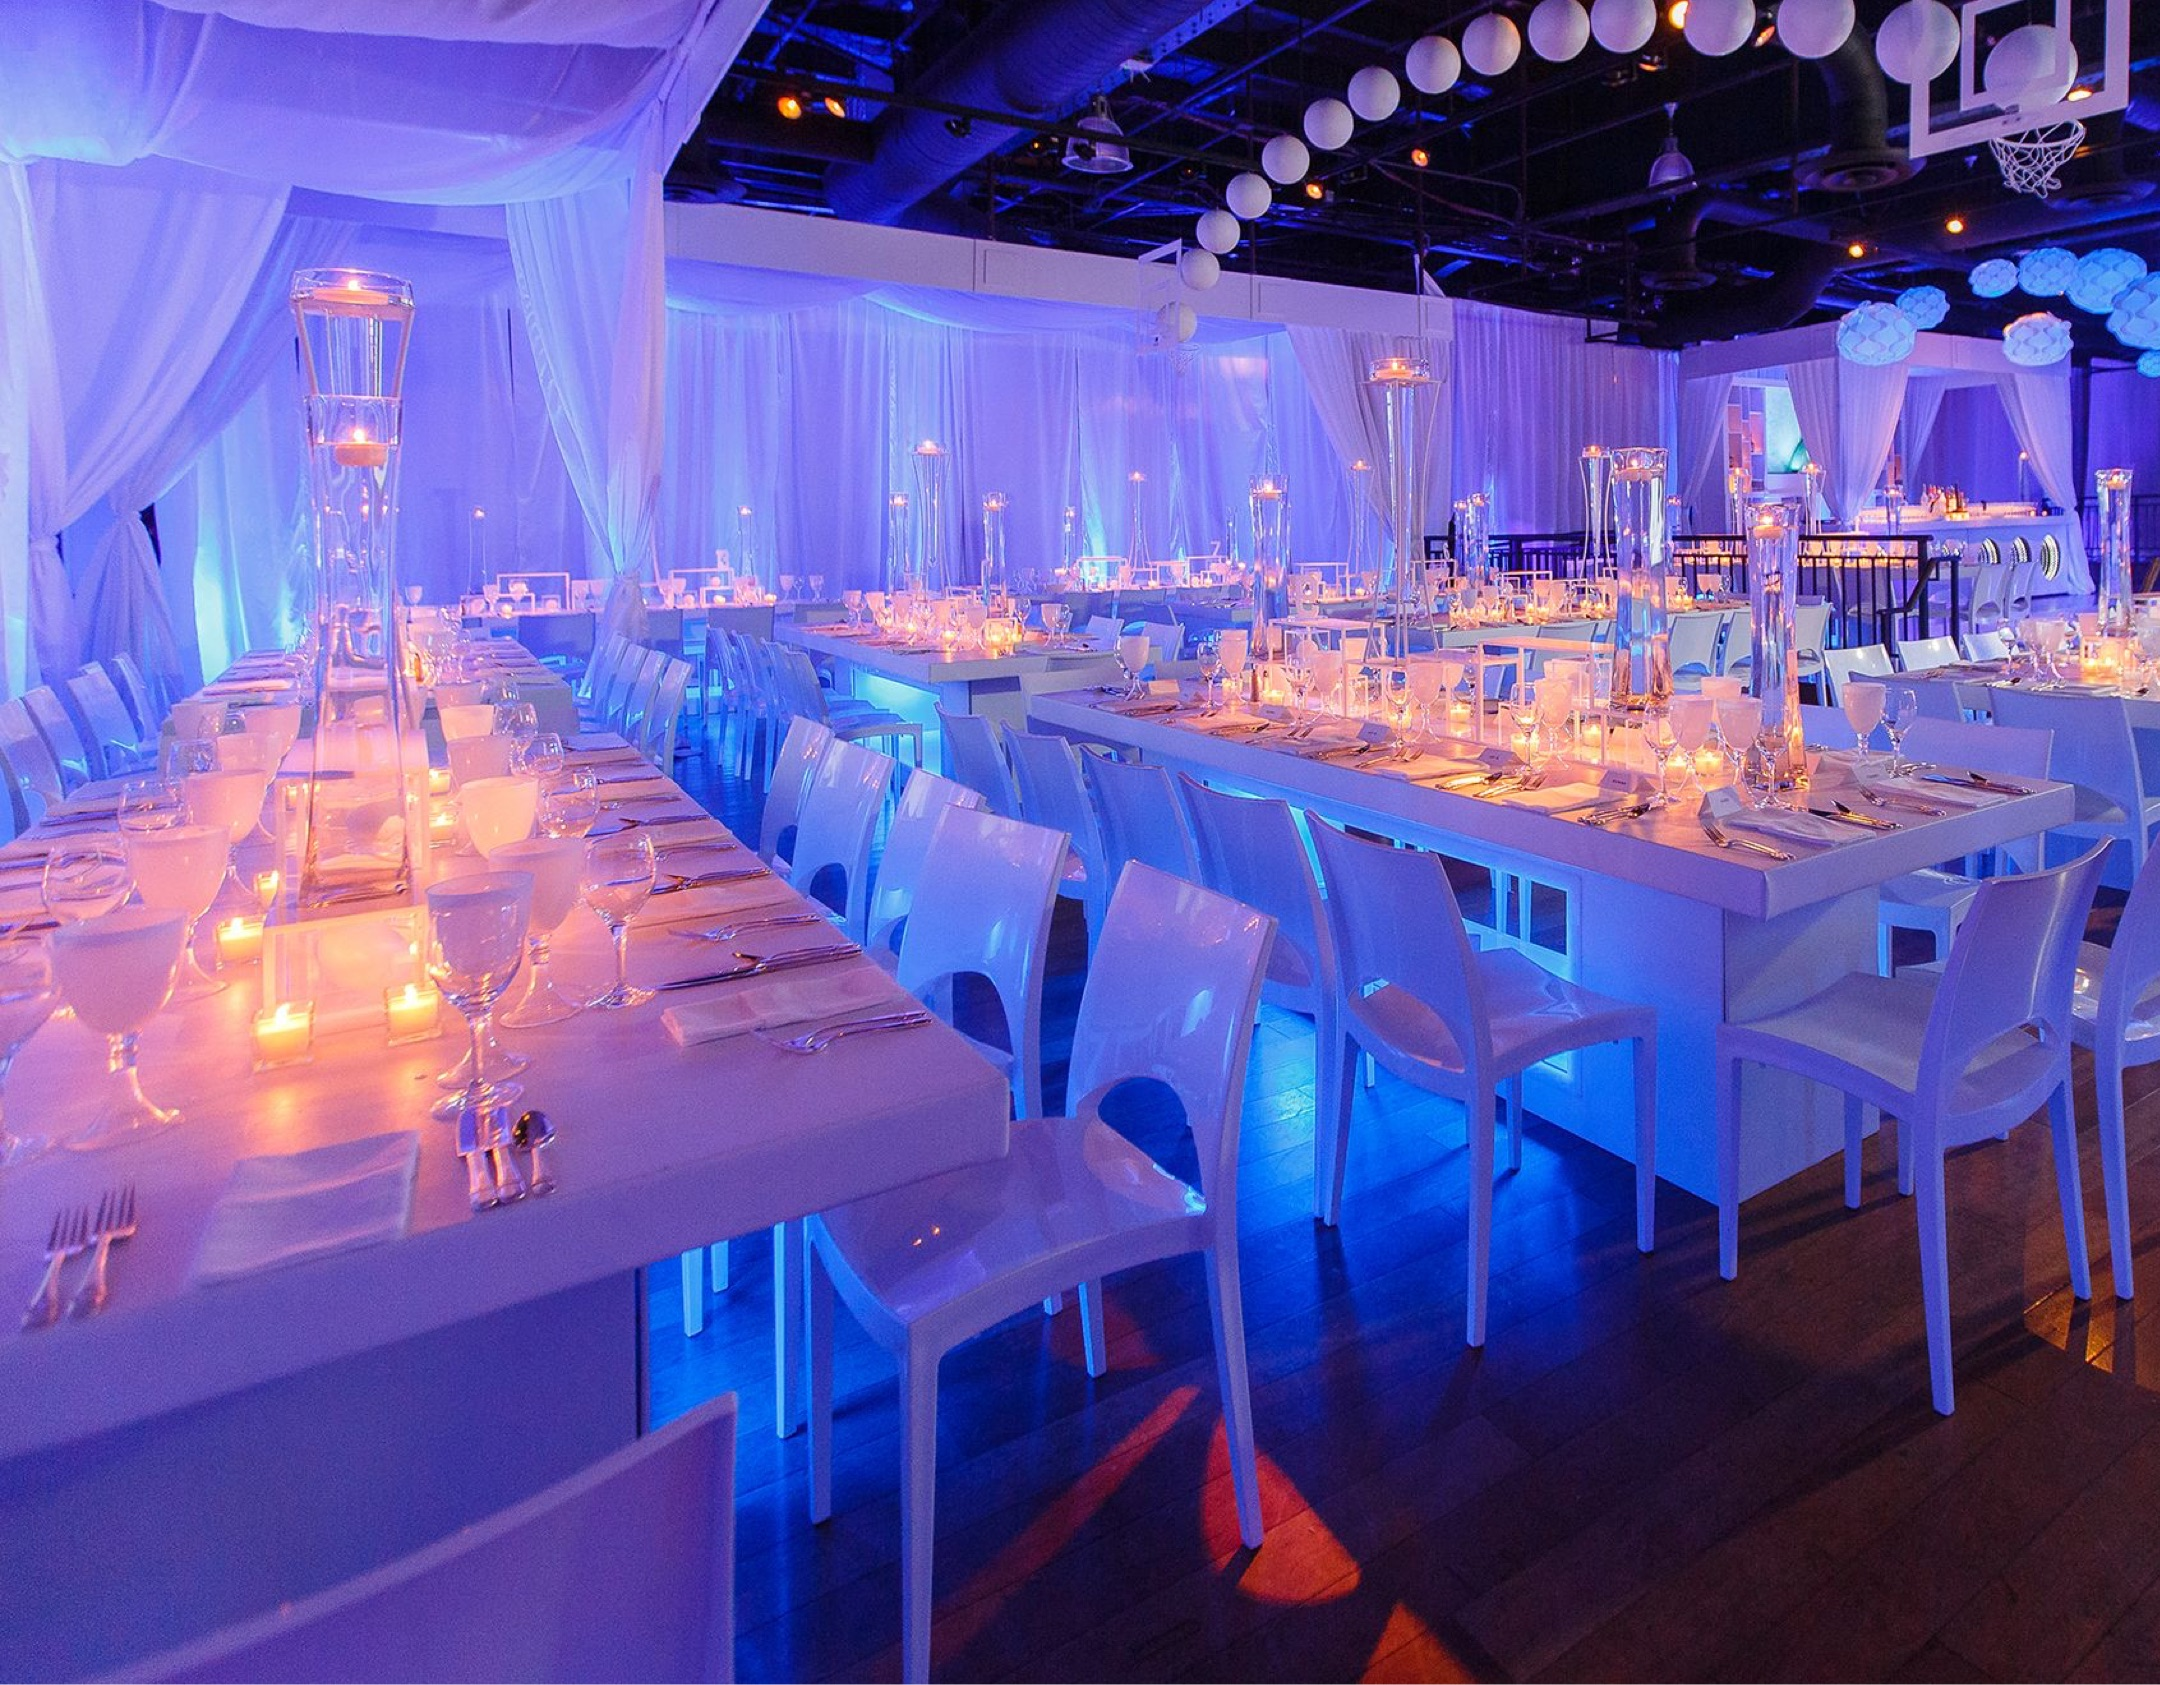 Blue and purple mood-lit dinner tables